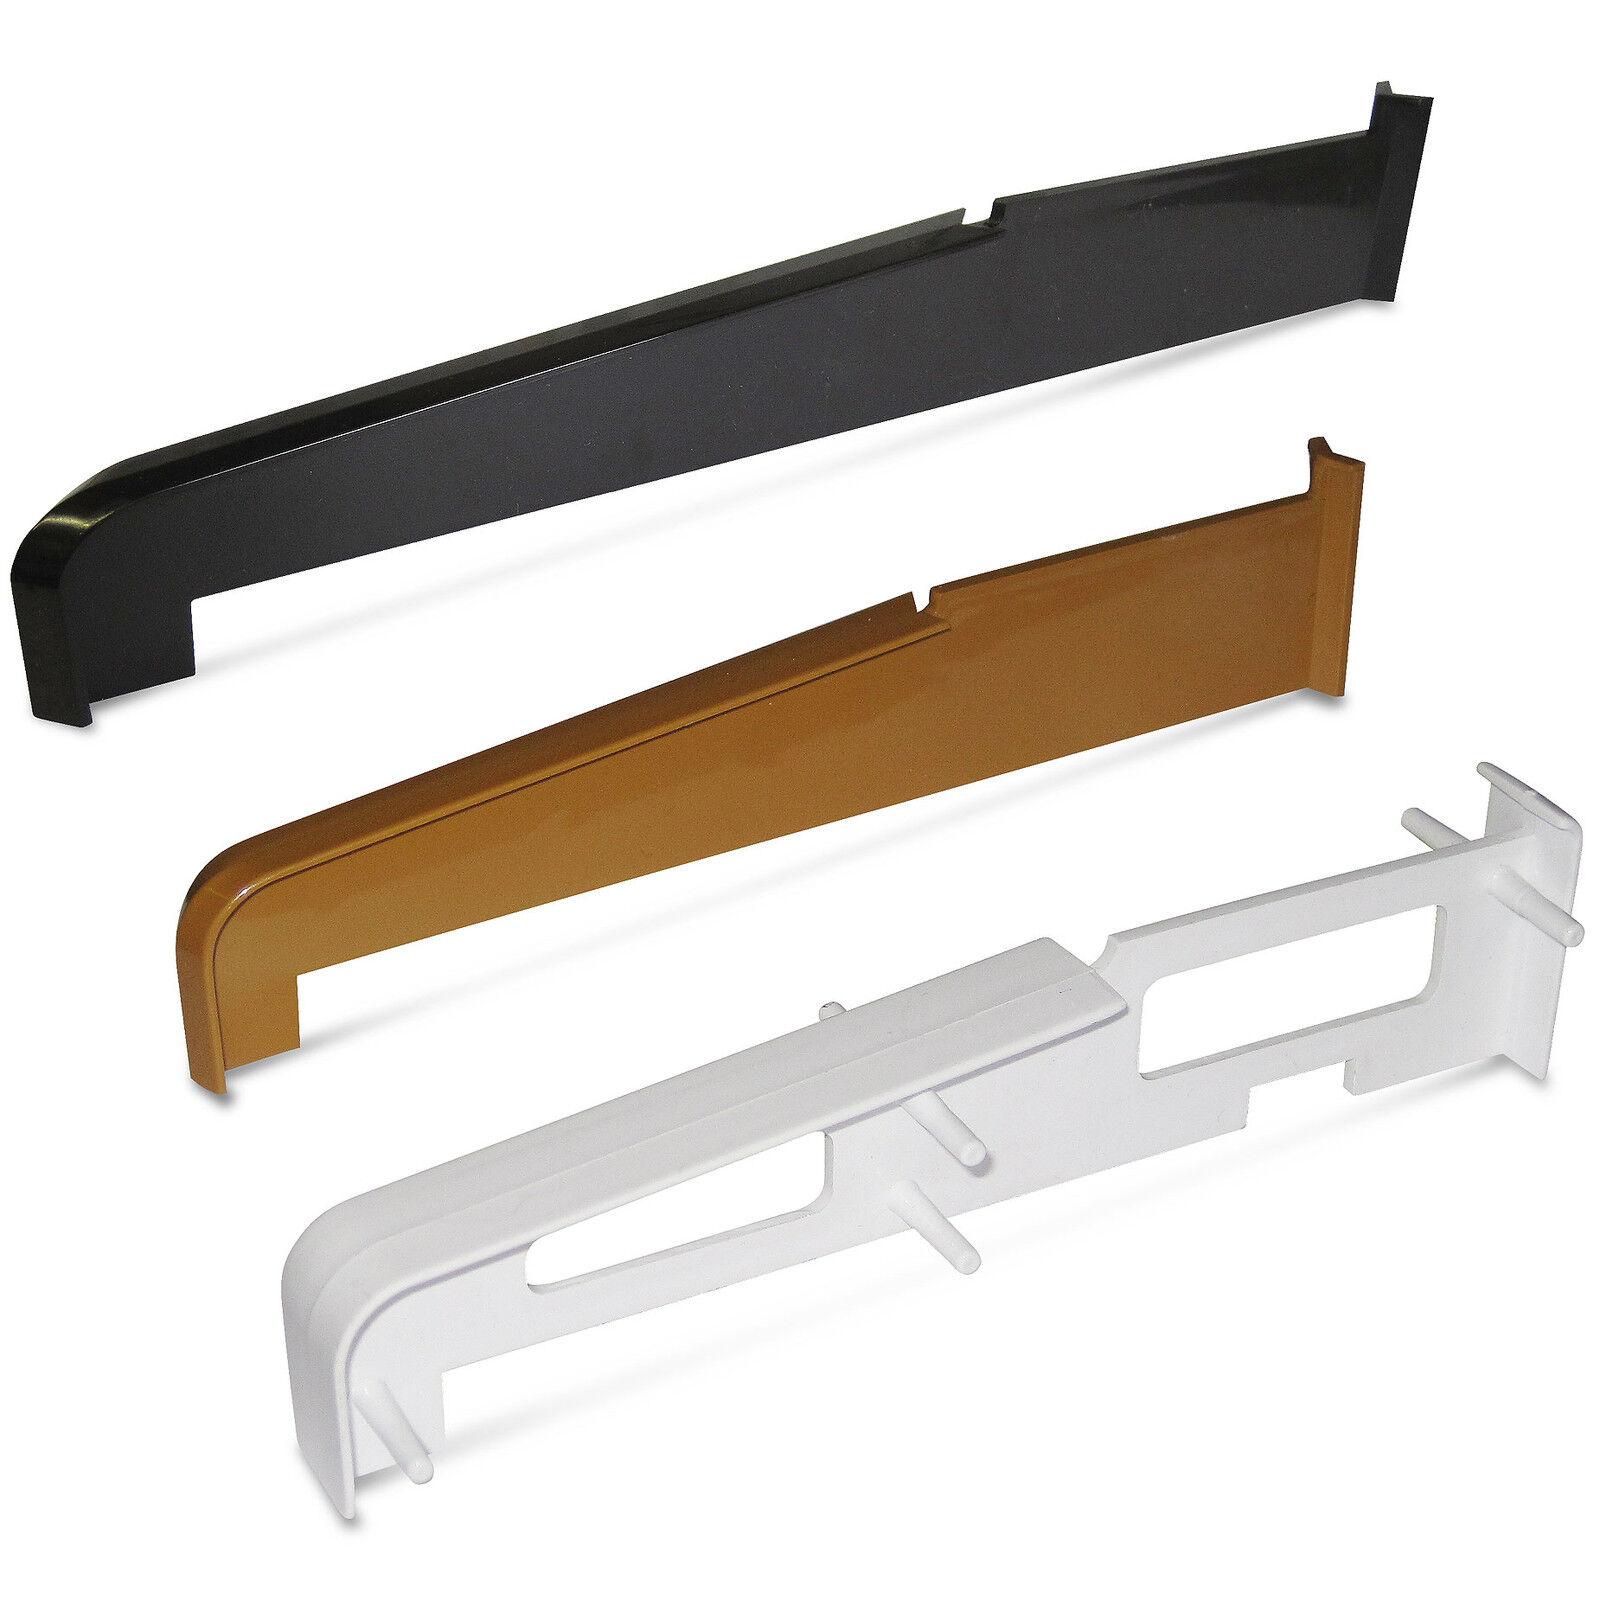 150 mm UPVC Window Cill Joint, Cover Strip / Plastic Corner PVC Sill Trim Joiner